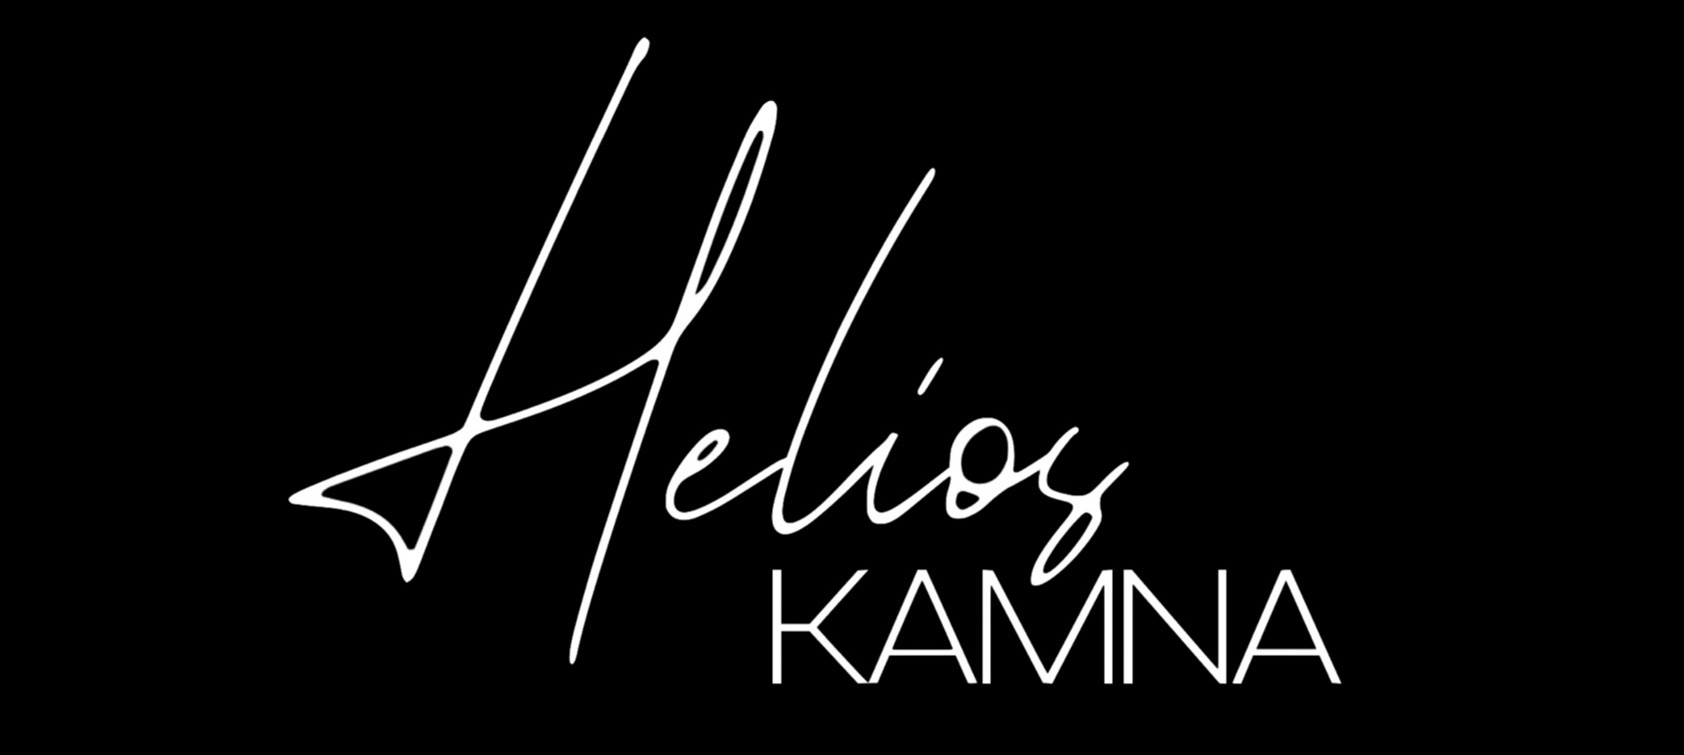 Kamna Helios